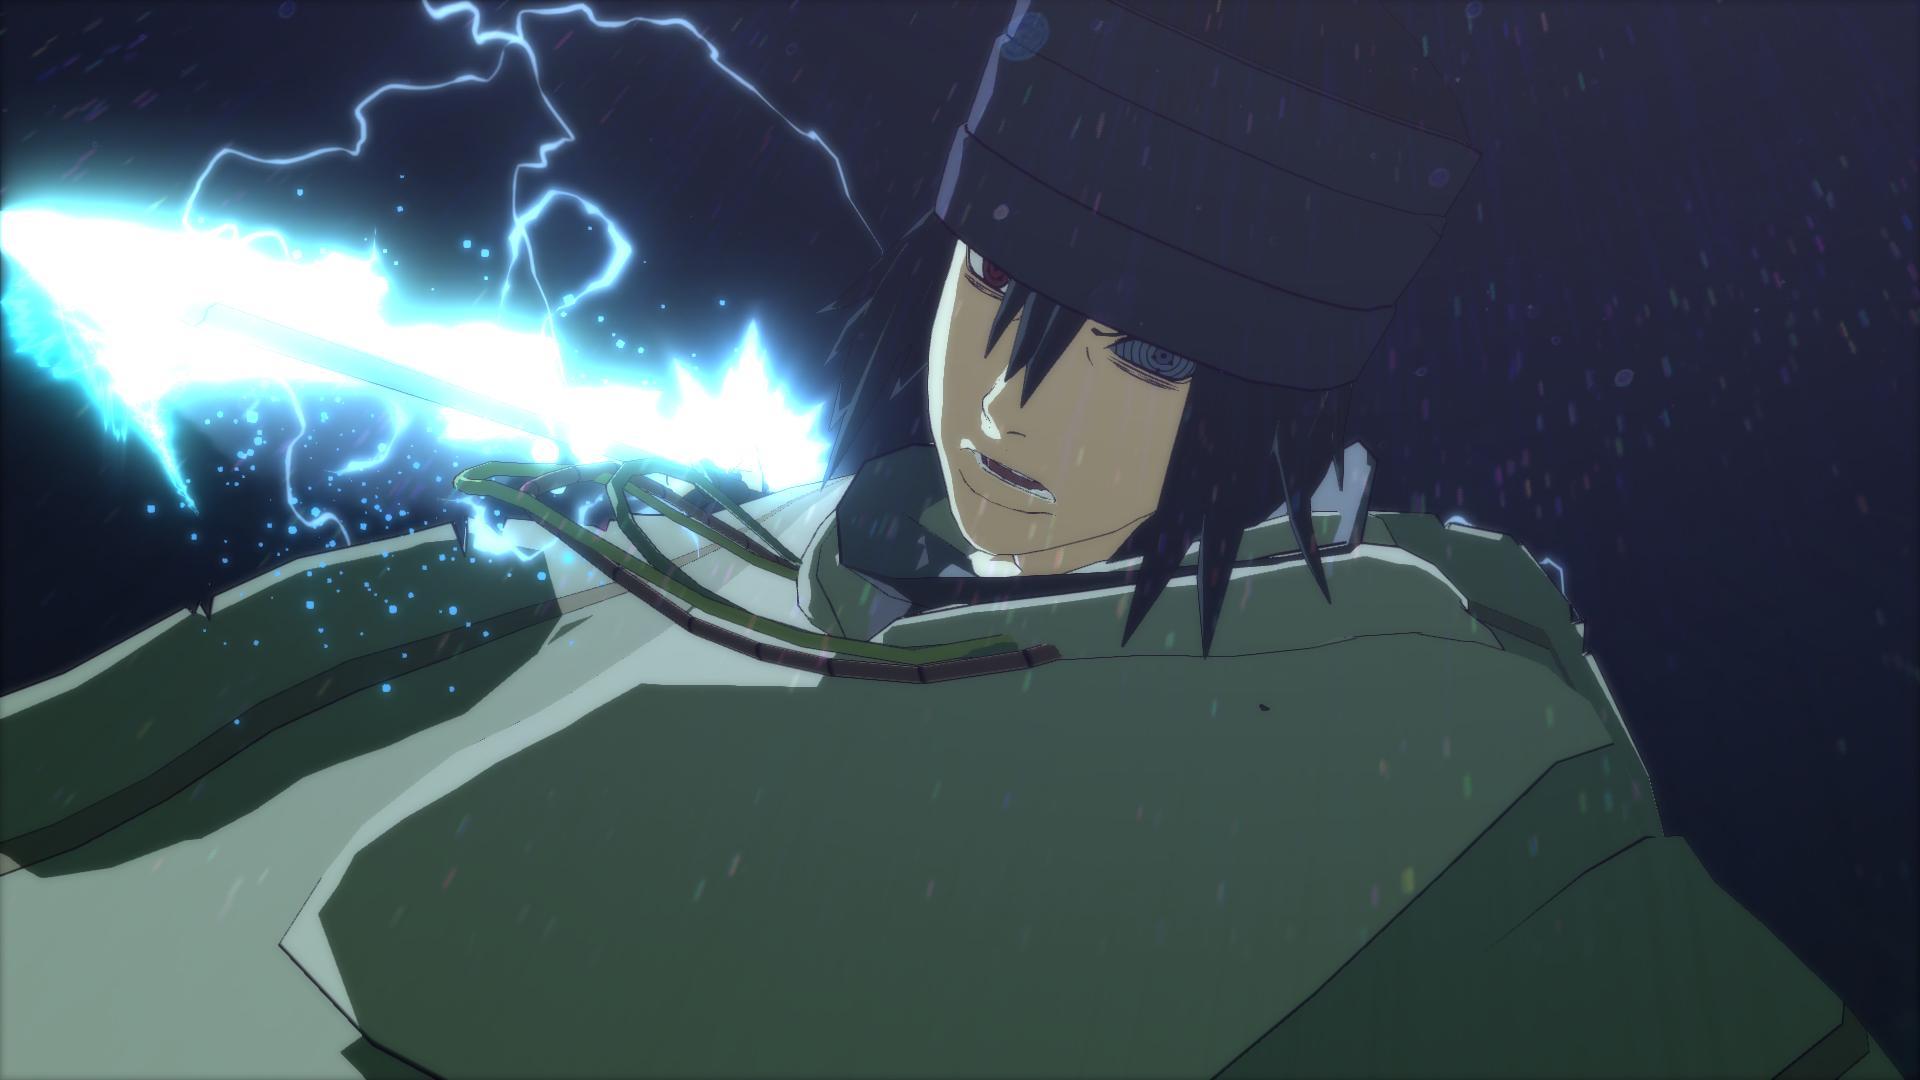 Naruto Shippuden Ultimate Ninja Storm 4 HD Full Wallpaper